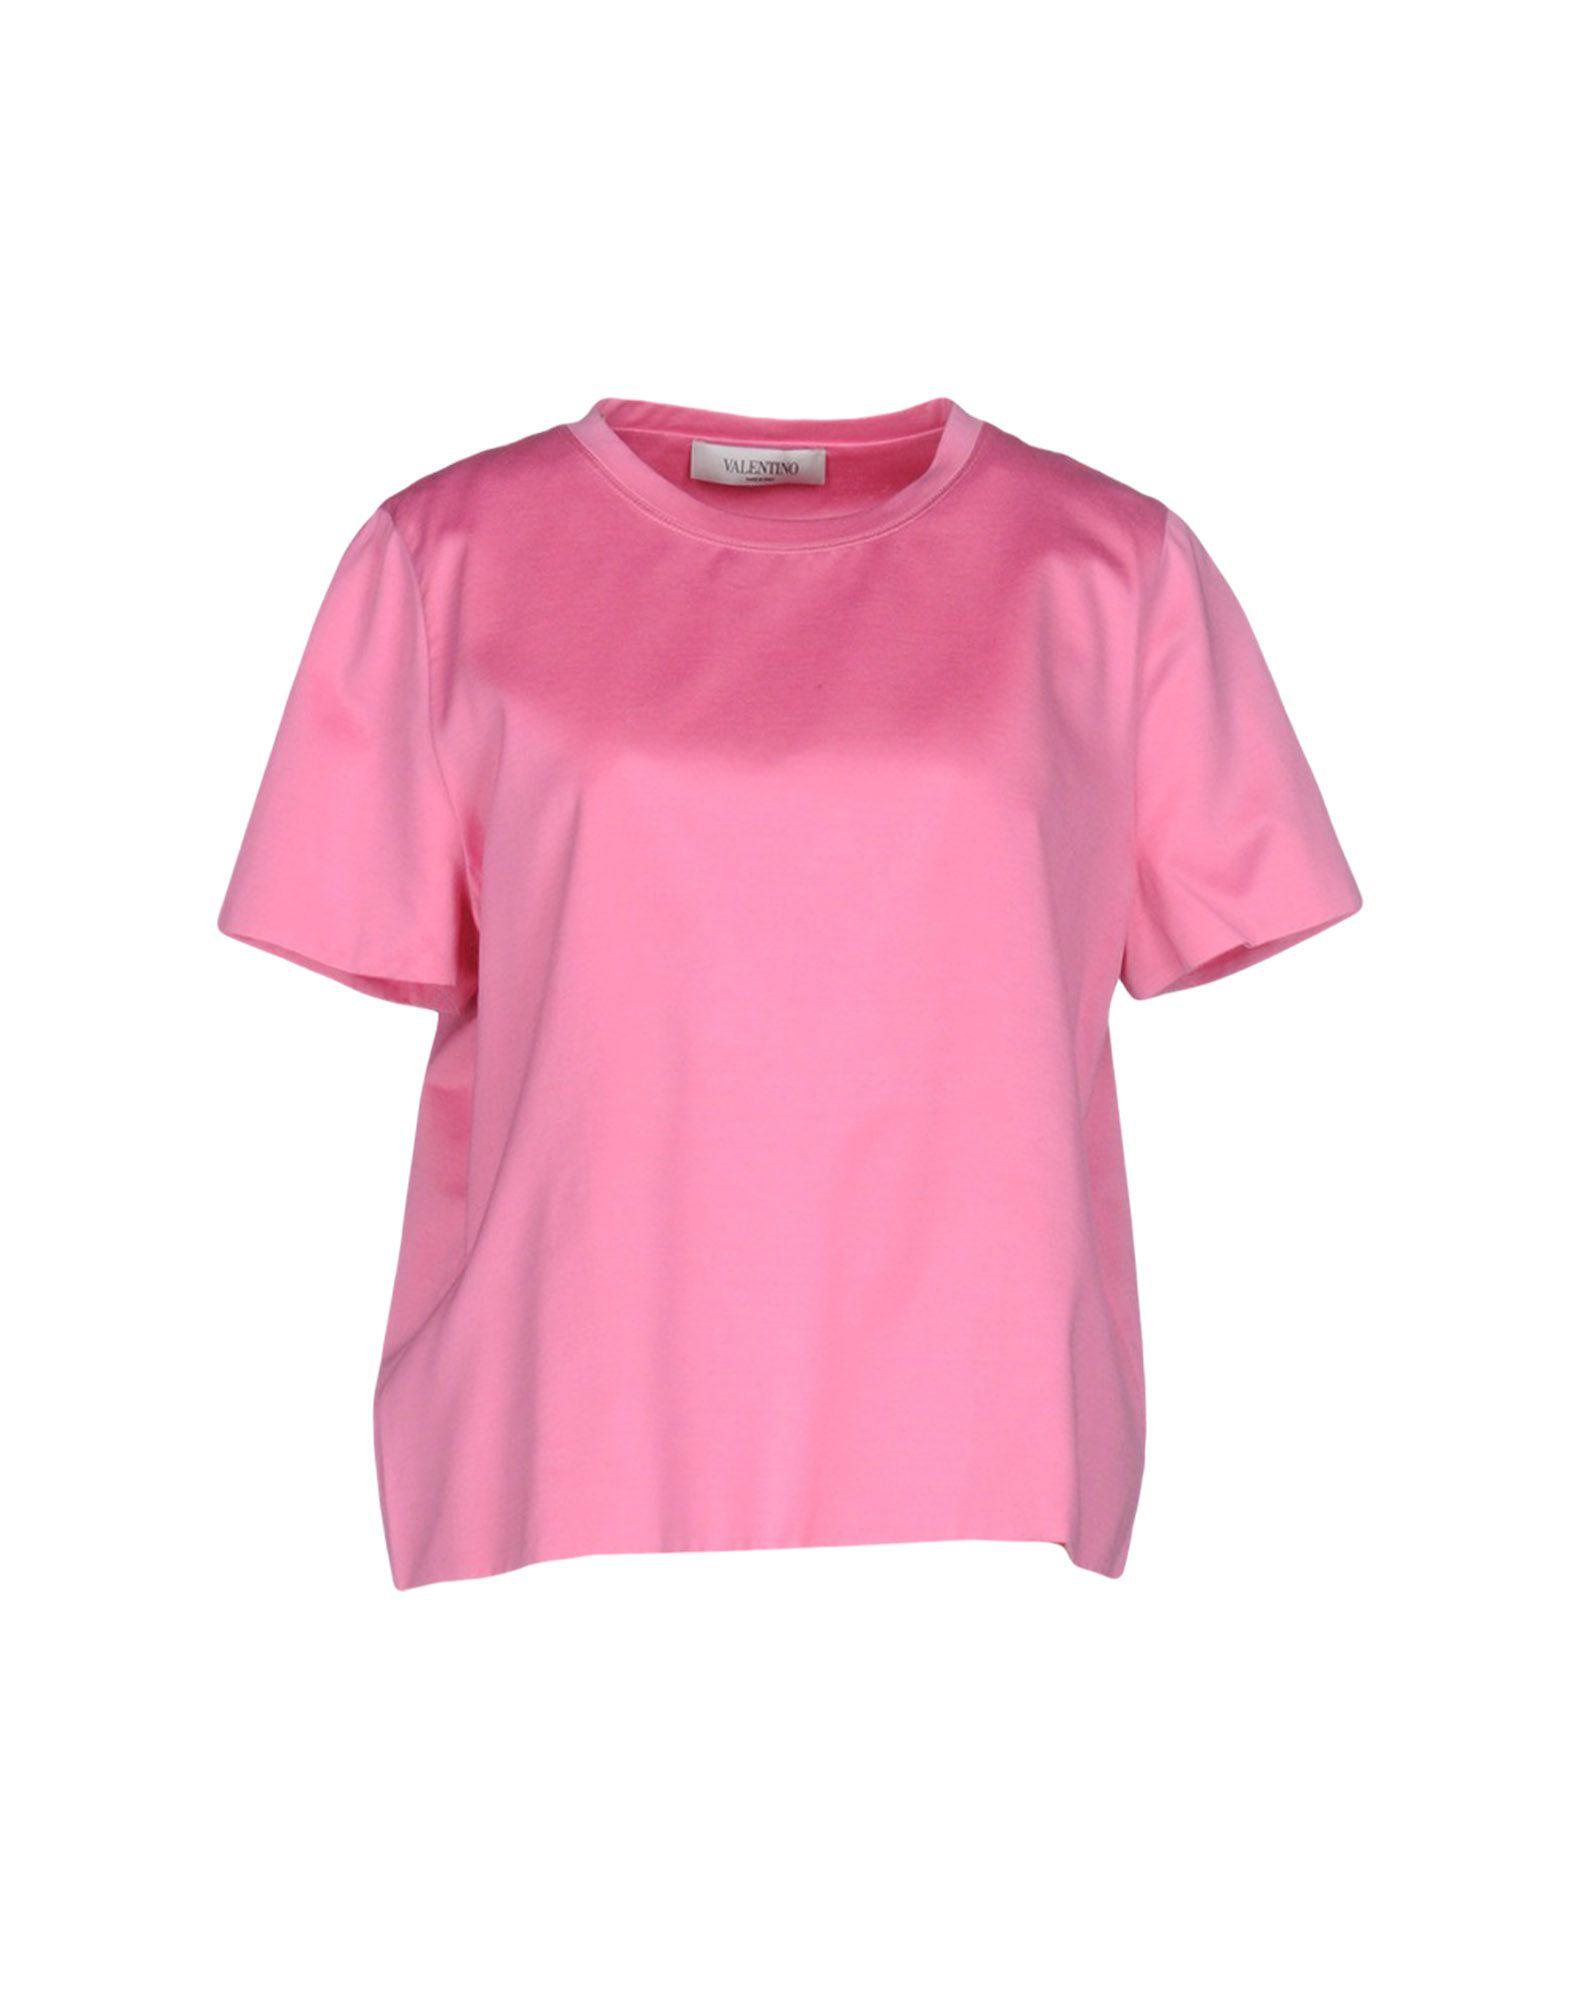 VALENTINO Damen Bluse Farbe Rosa Größe 3